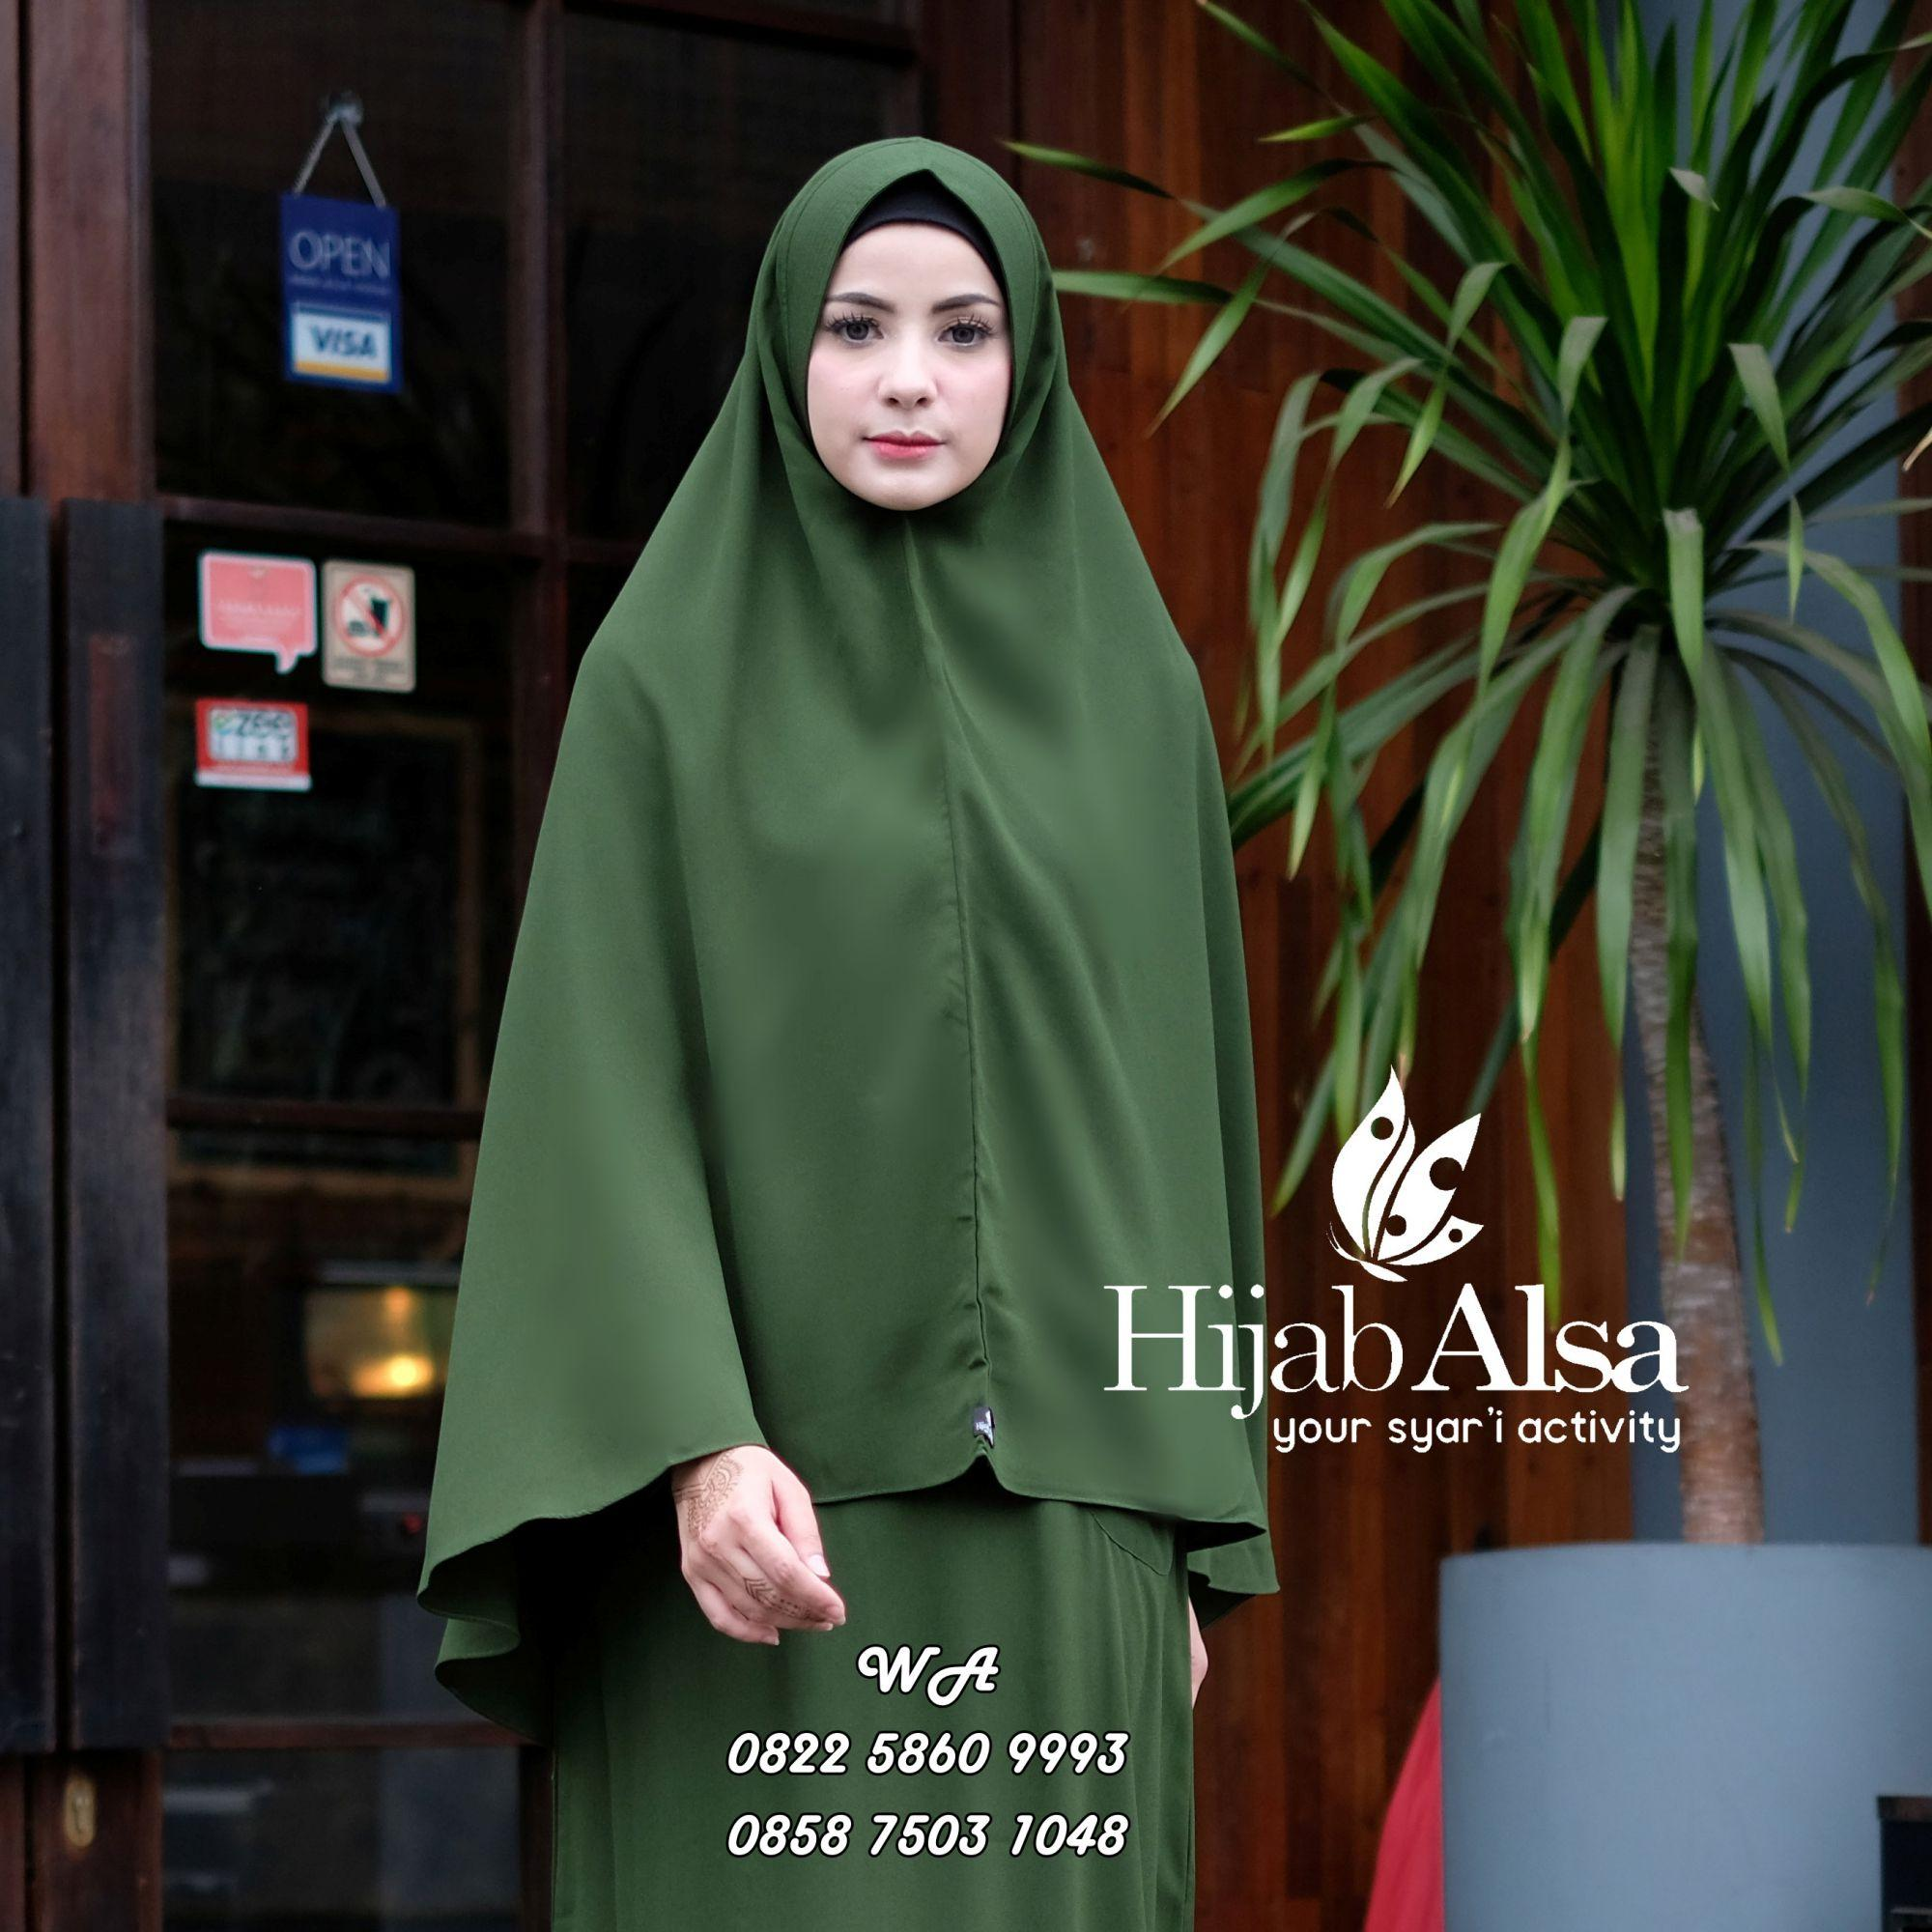 Hijab Alsa Raisa Jilbab Syari Instan Langsung Pakai Warna Hijau Army